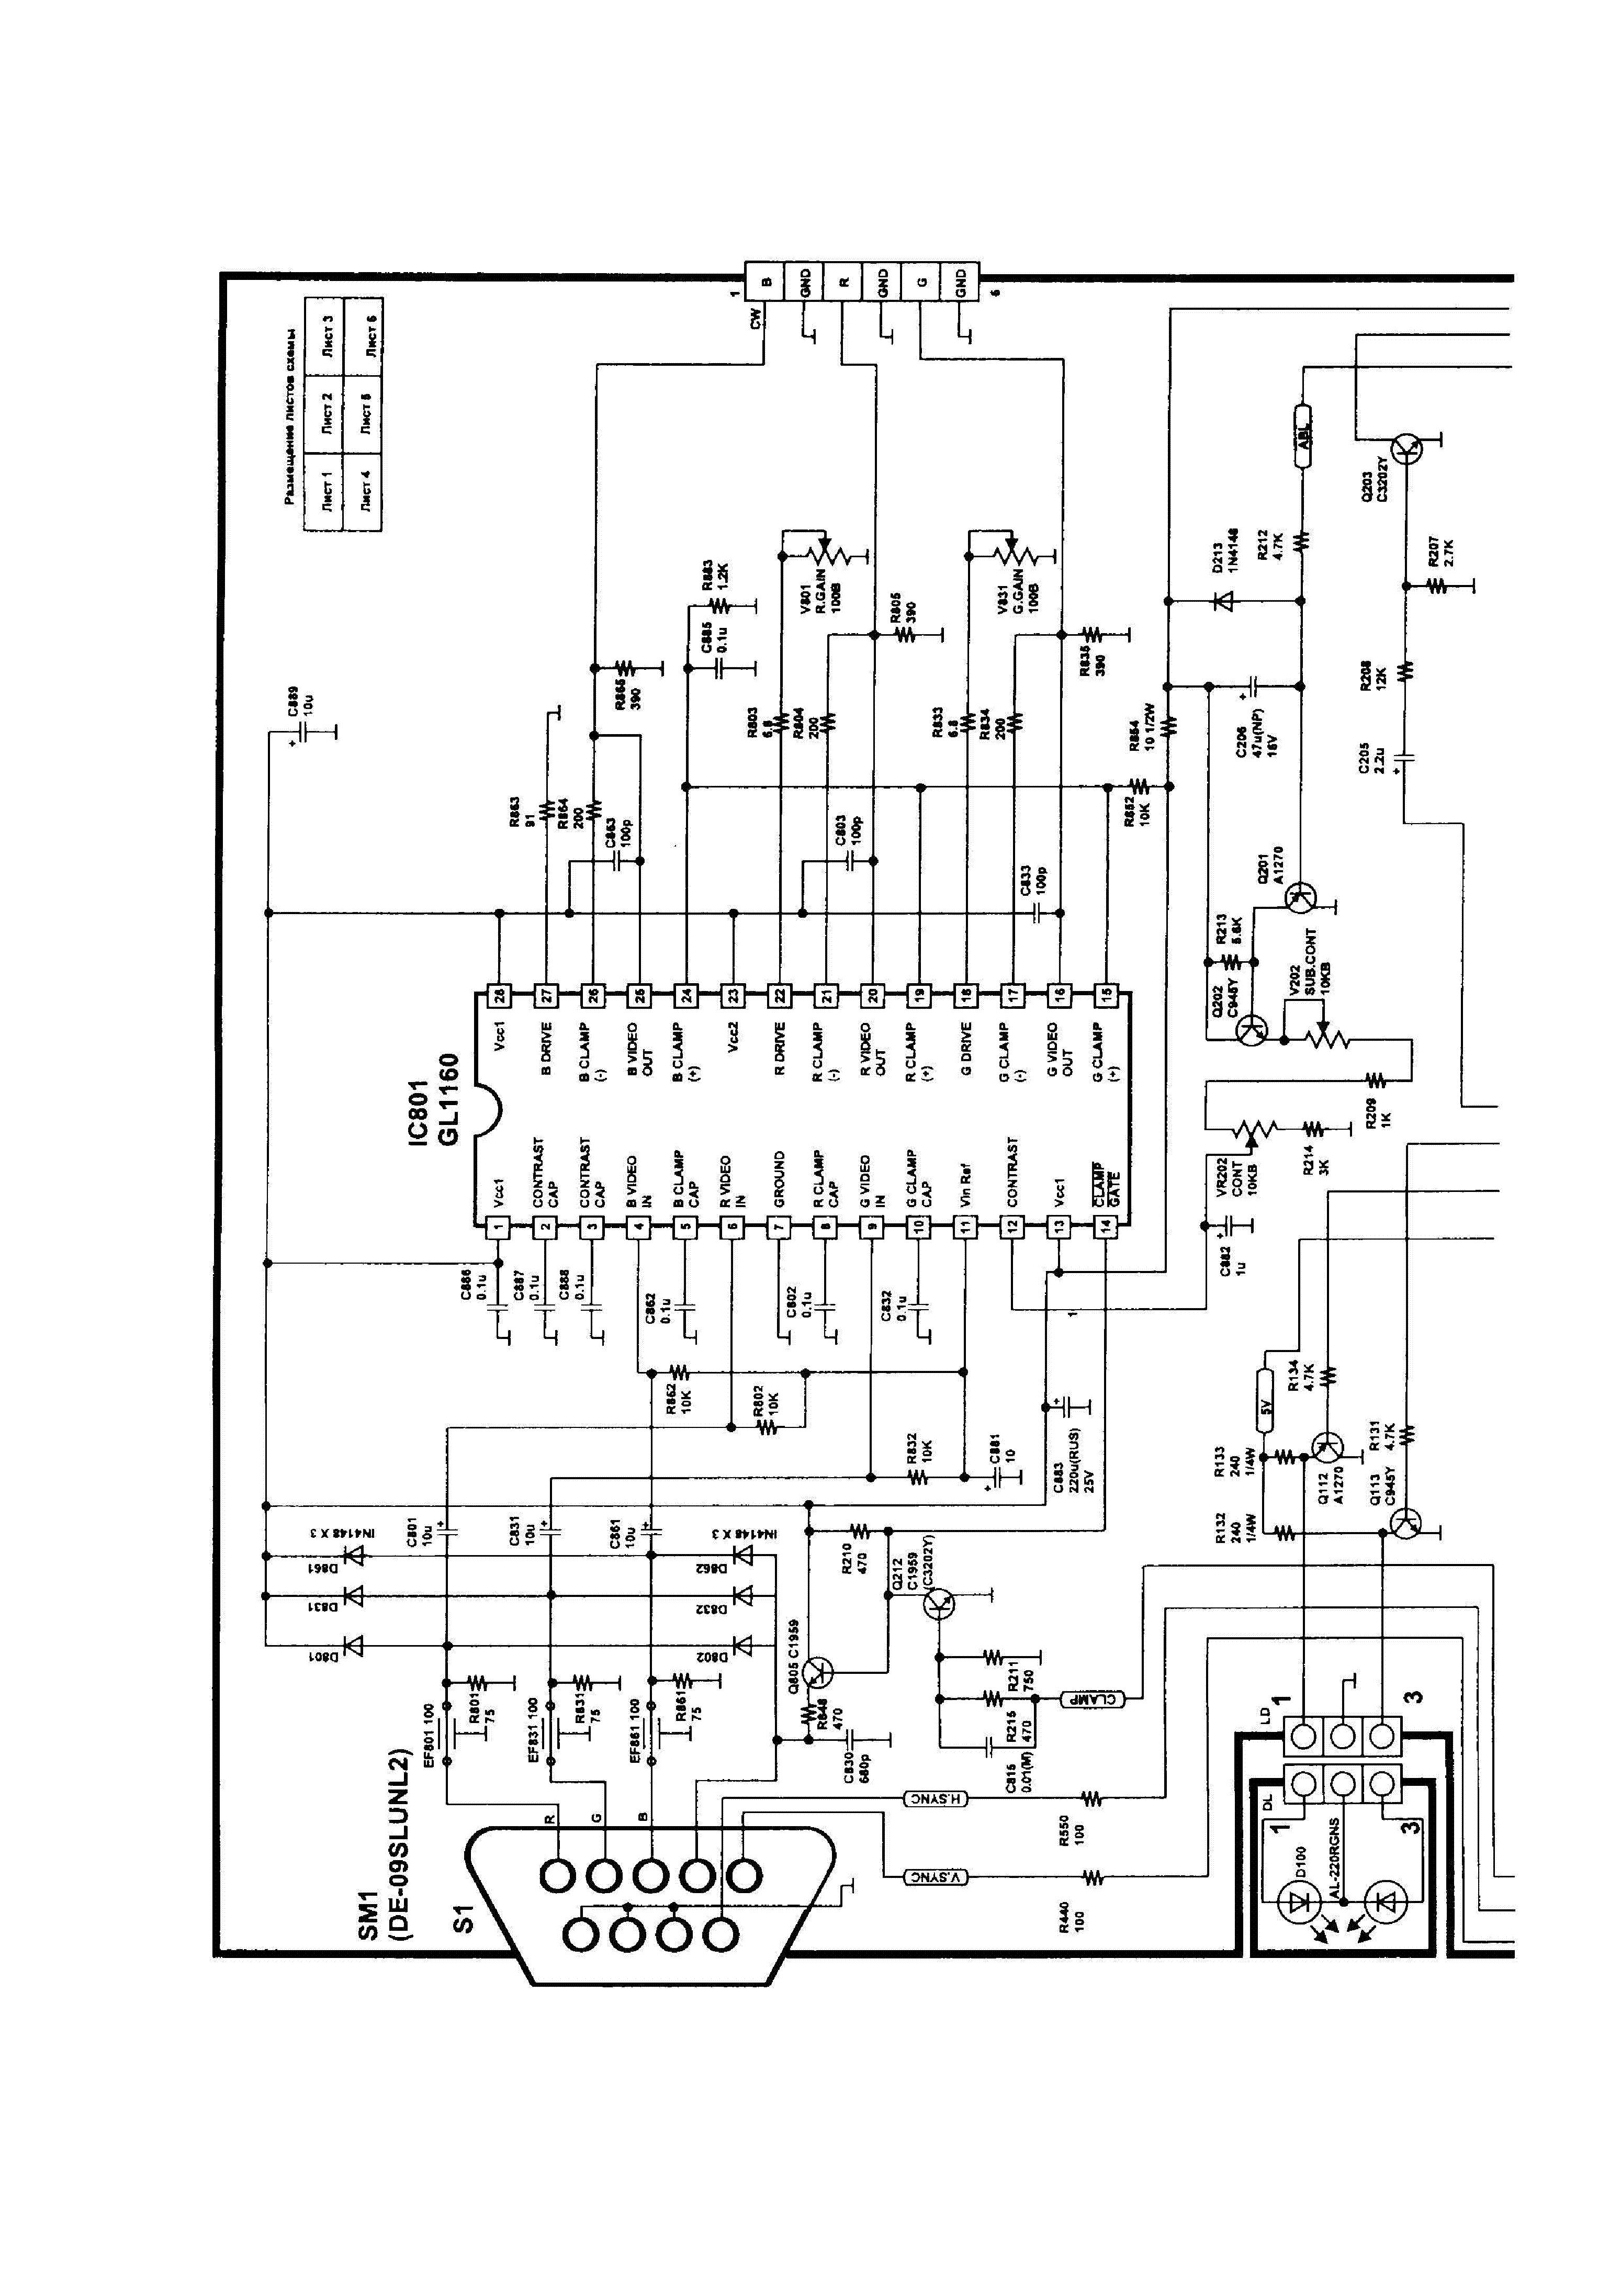 Daewoo Cmc1424s Service Manual Download Schematics